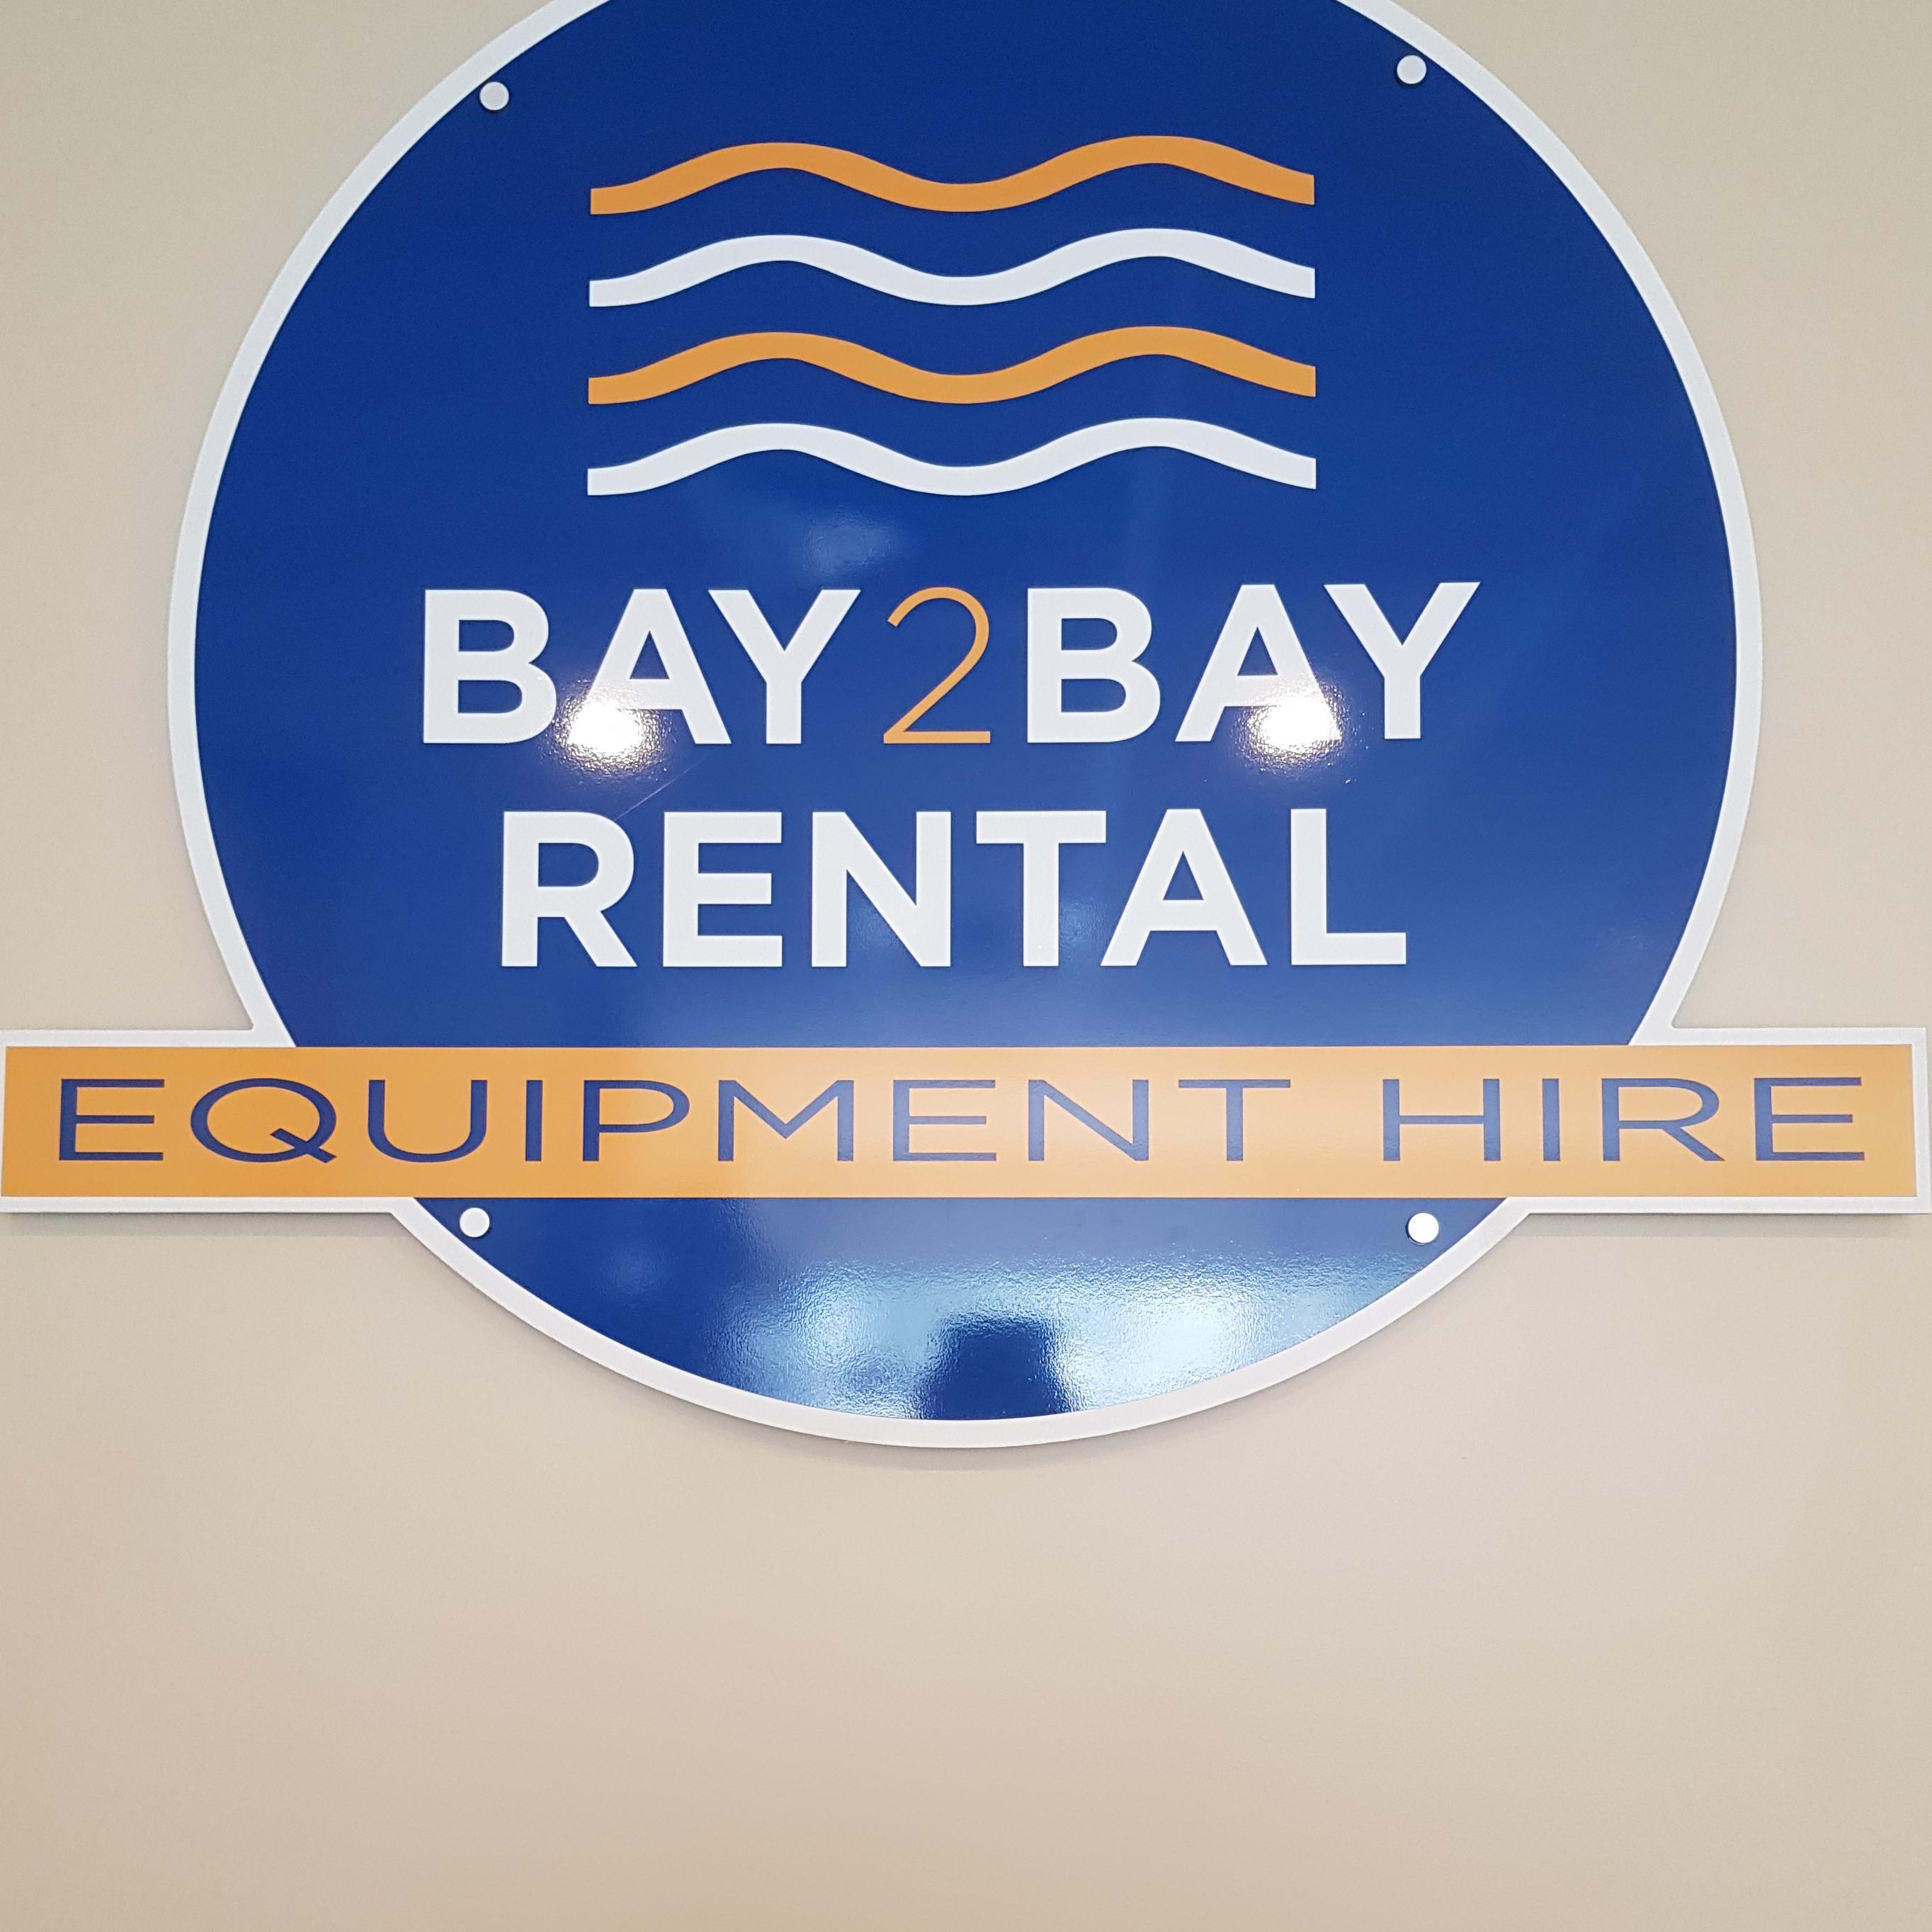 Bay 2 Bay Rental Equipment Hire